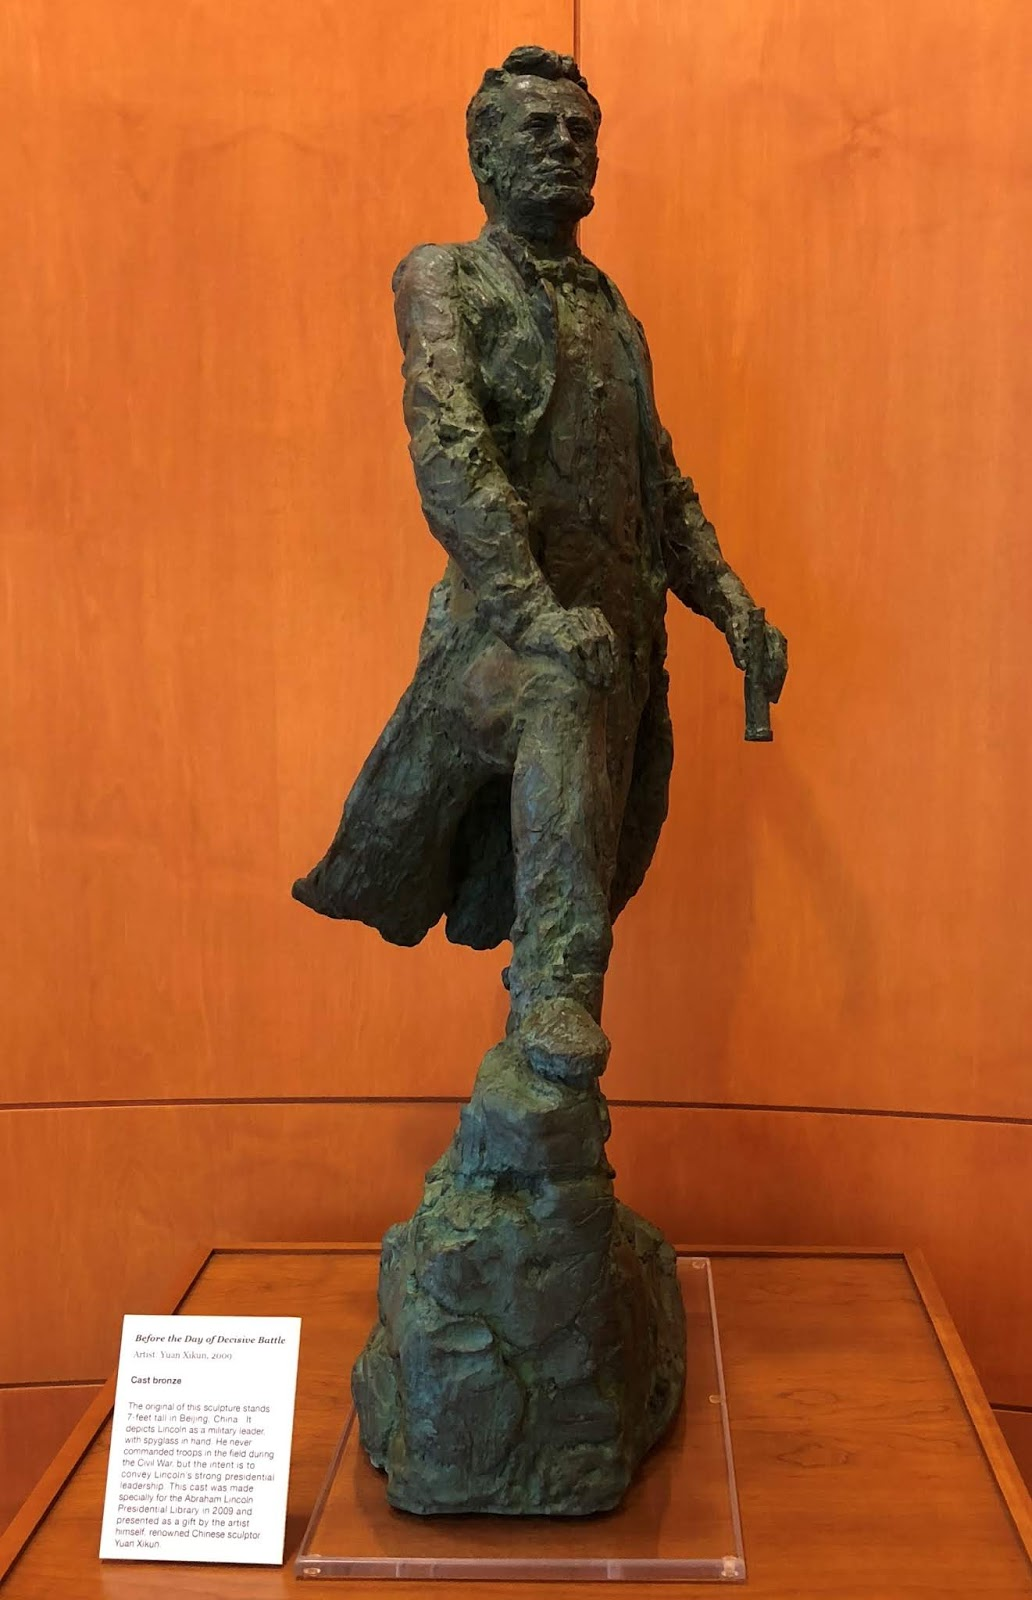 ABRAHAM LINCOLN'S ALMANAC TRIAL: September 2018